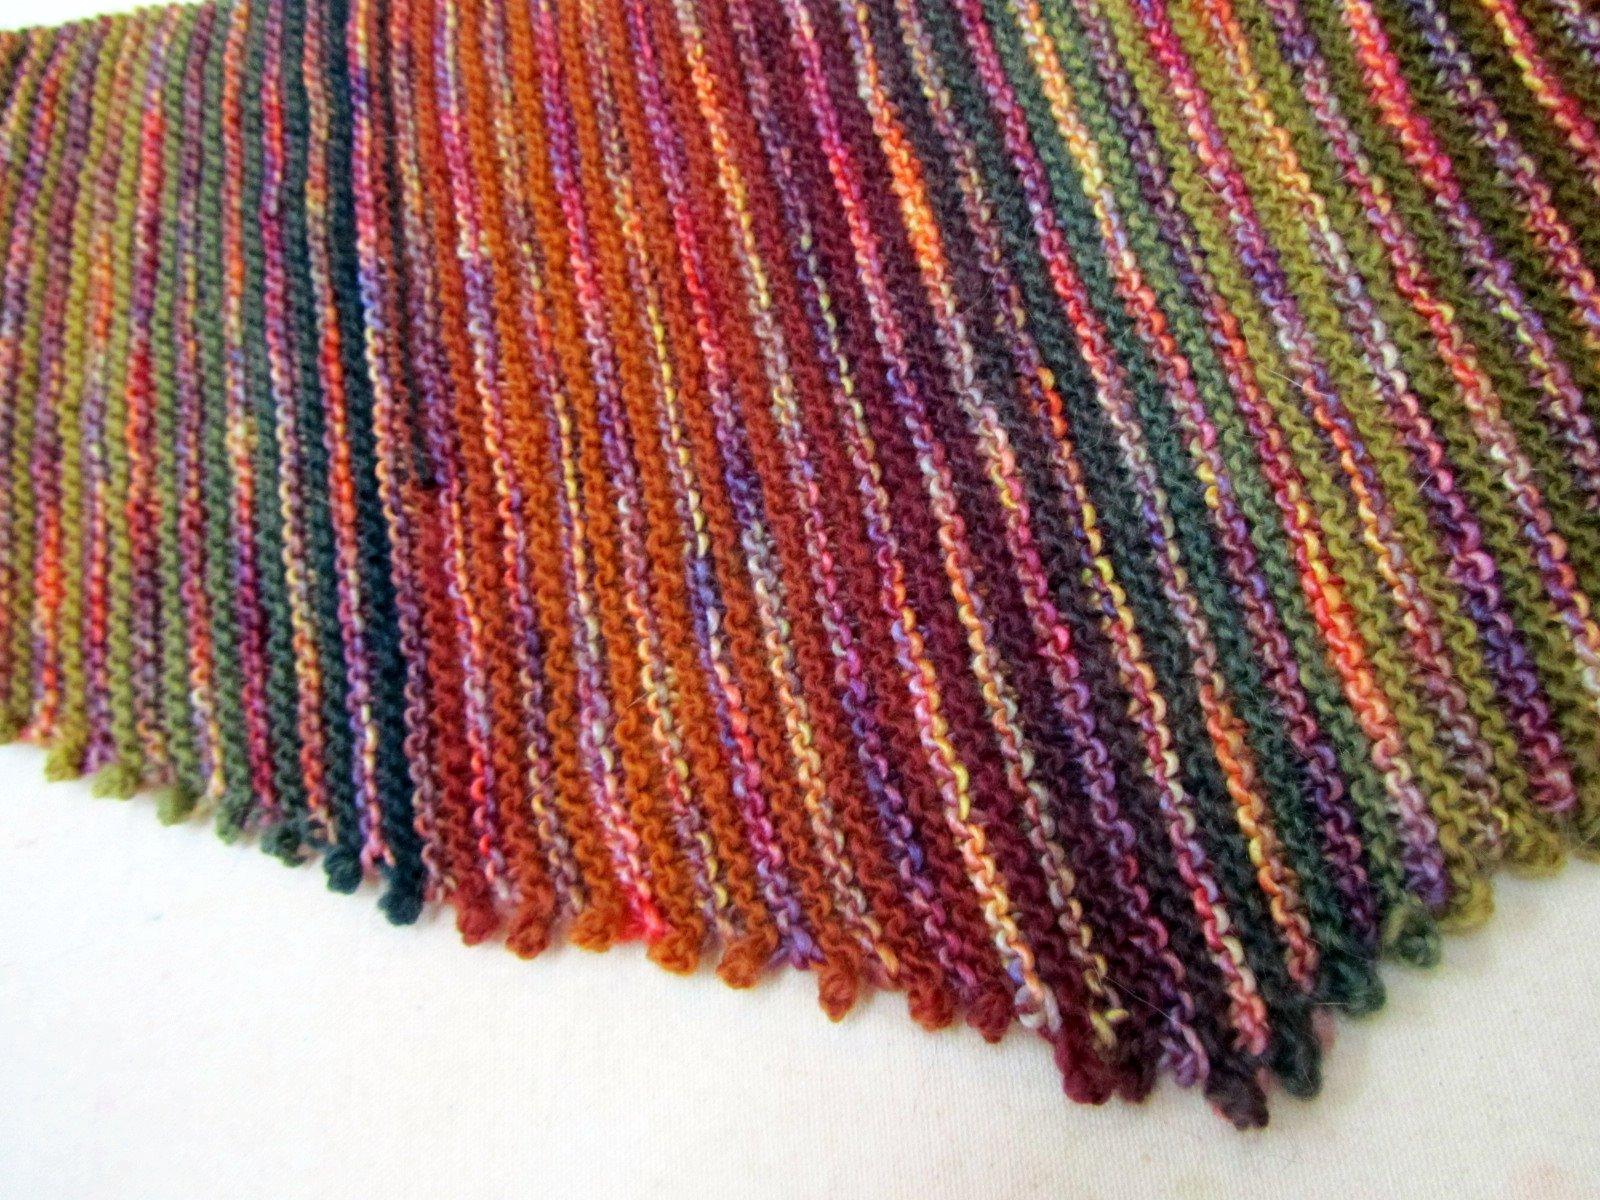 Malabrigo Knitting Patterns : Fibermania: Baktus Scarf #4